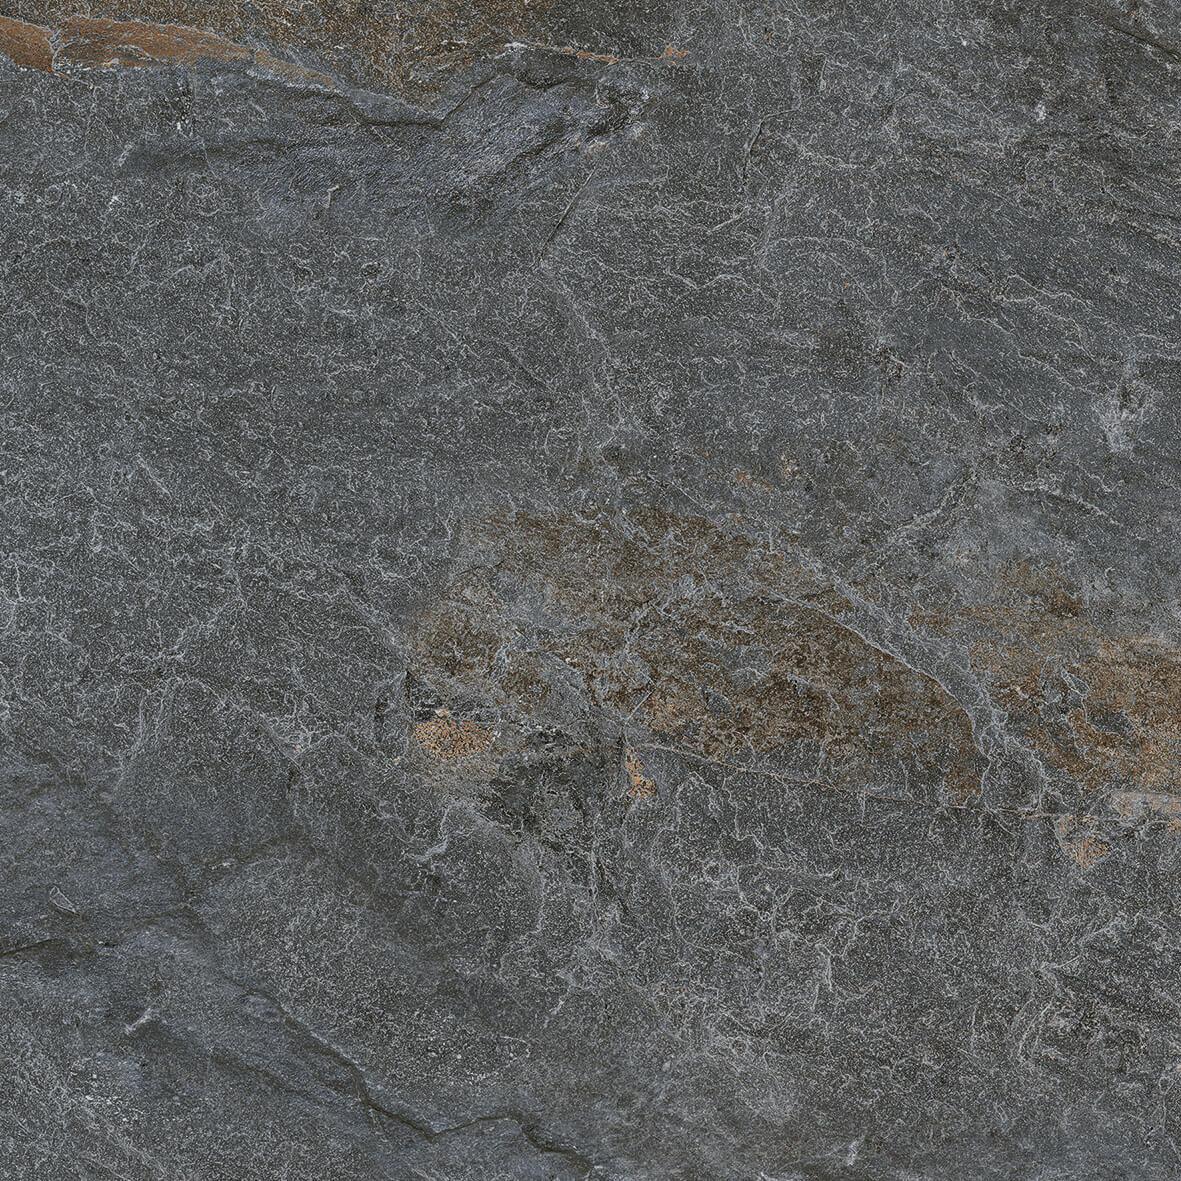 Dolomite Dark Major 500x1000mm_Stiles_Product_Image